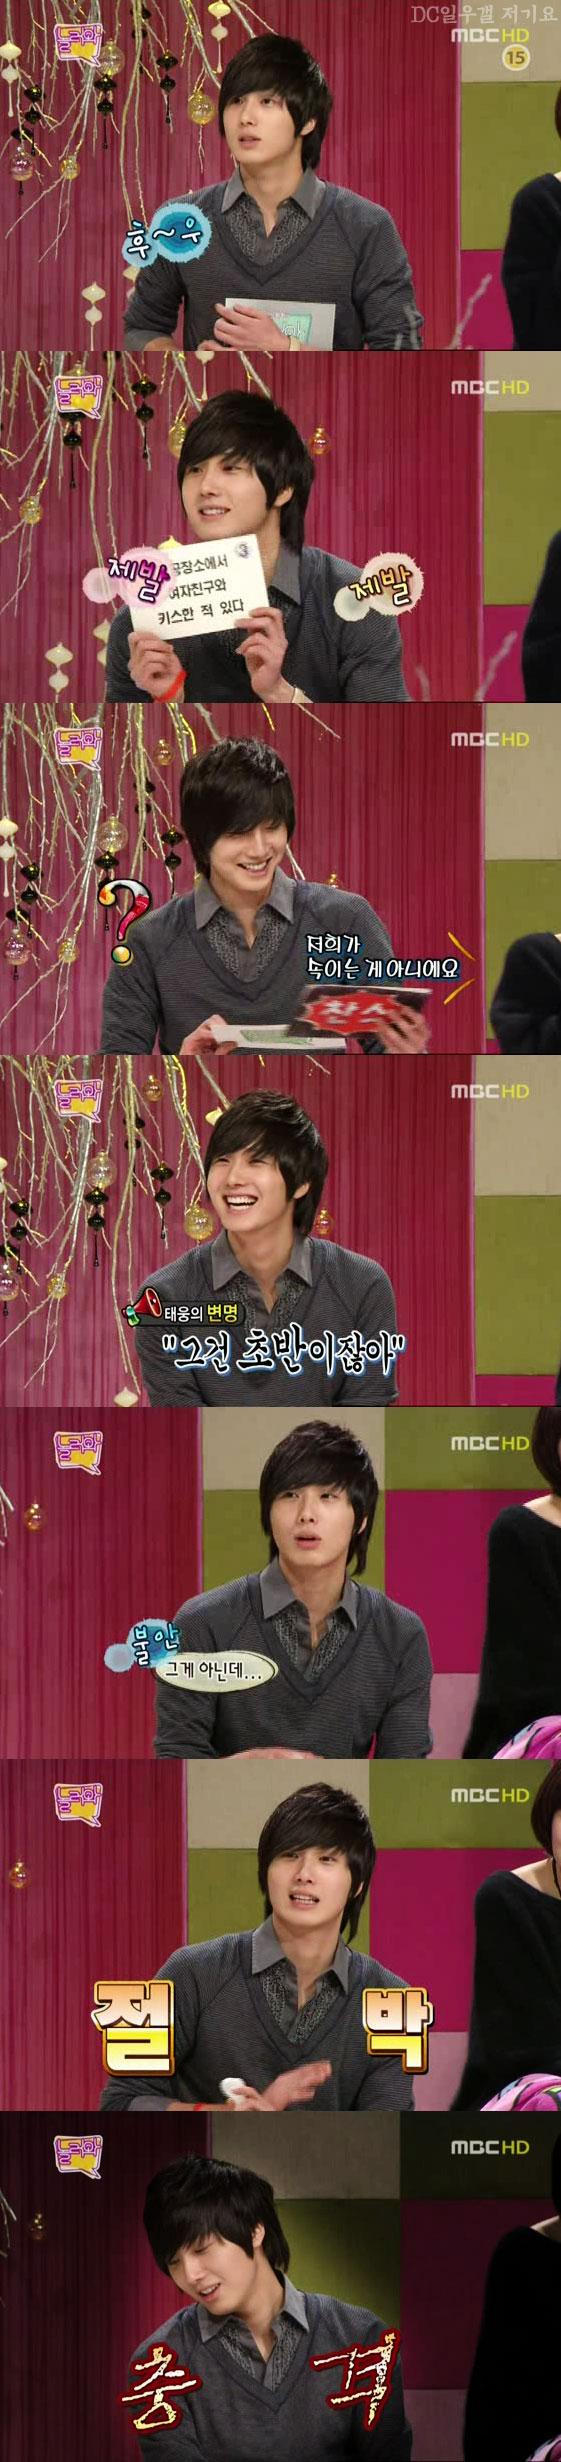 2007 12 Yoo Jae-suk & Kim Won-hee's Come to Play 25